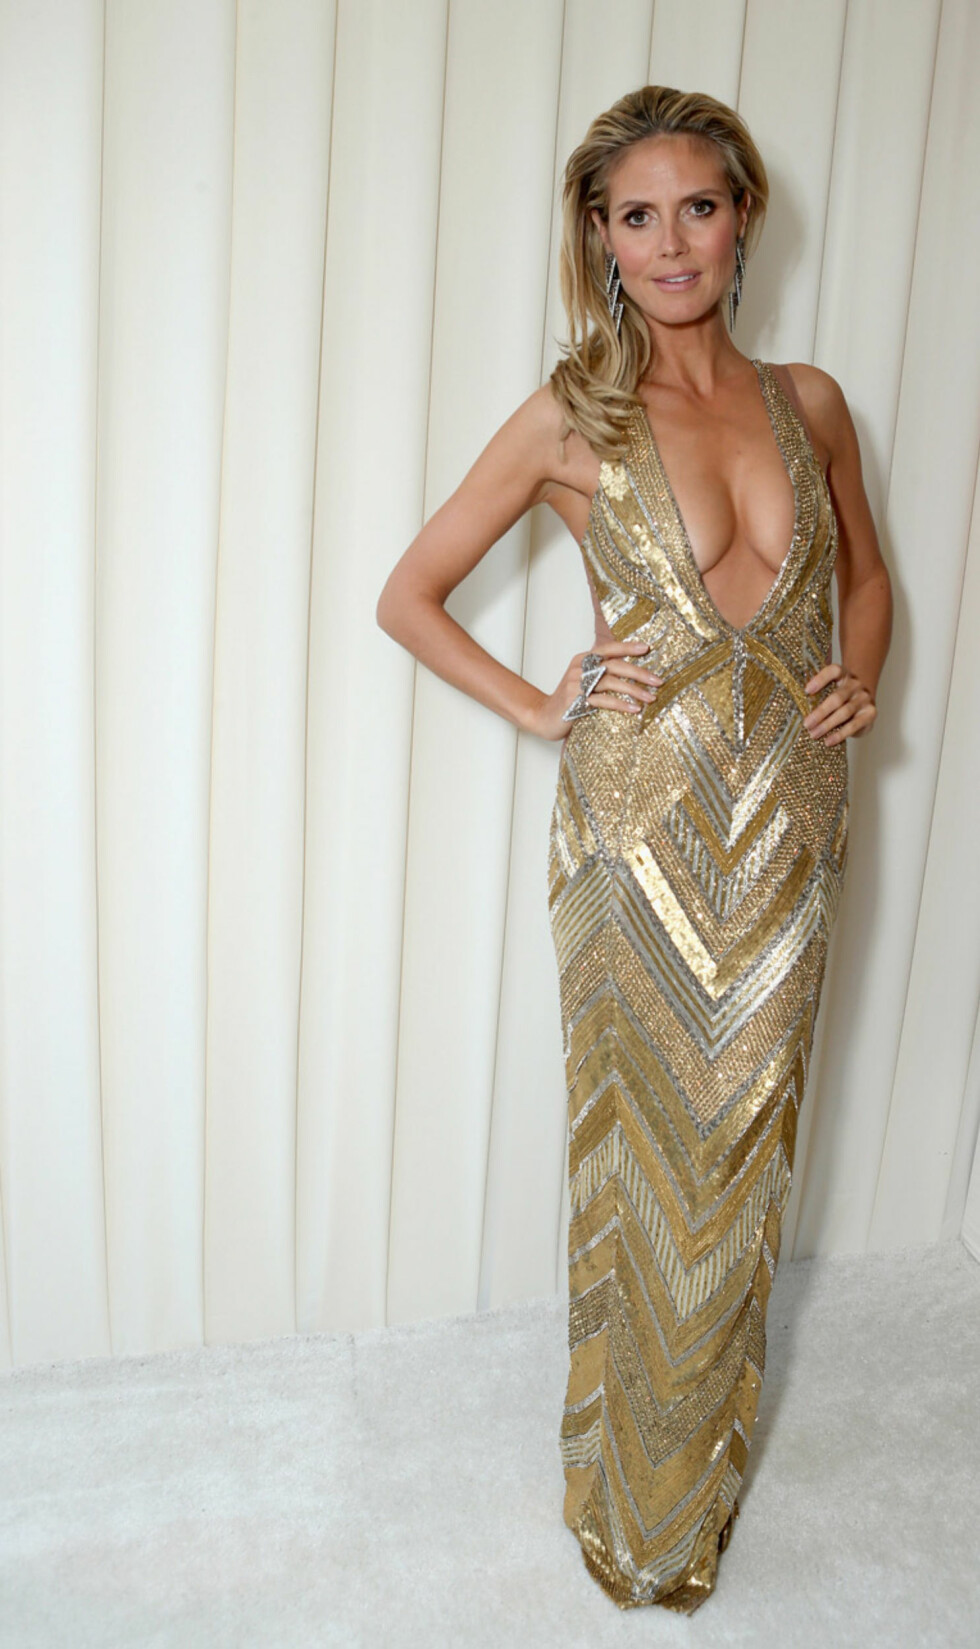 Heidi Klums puppe-display på Oscar-fest